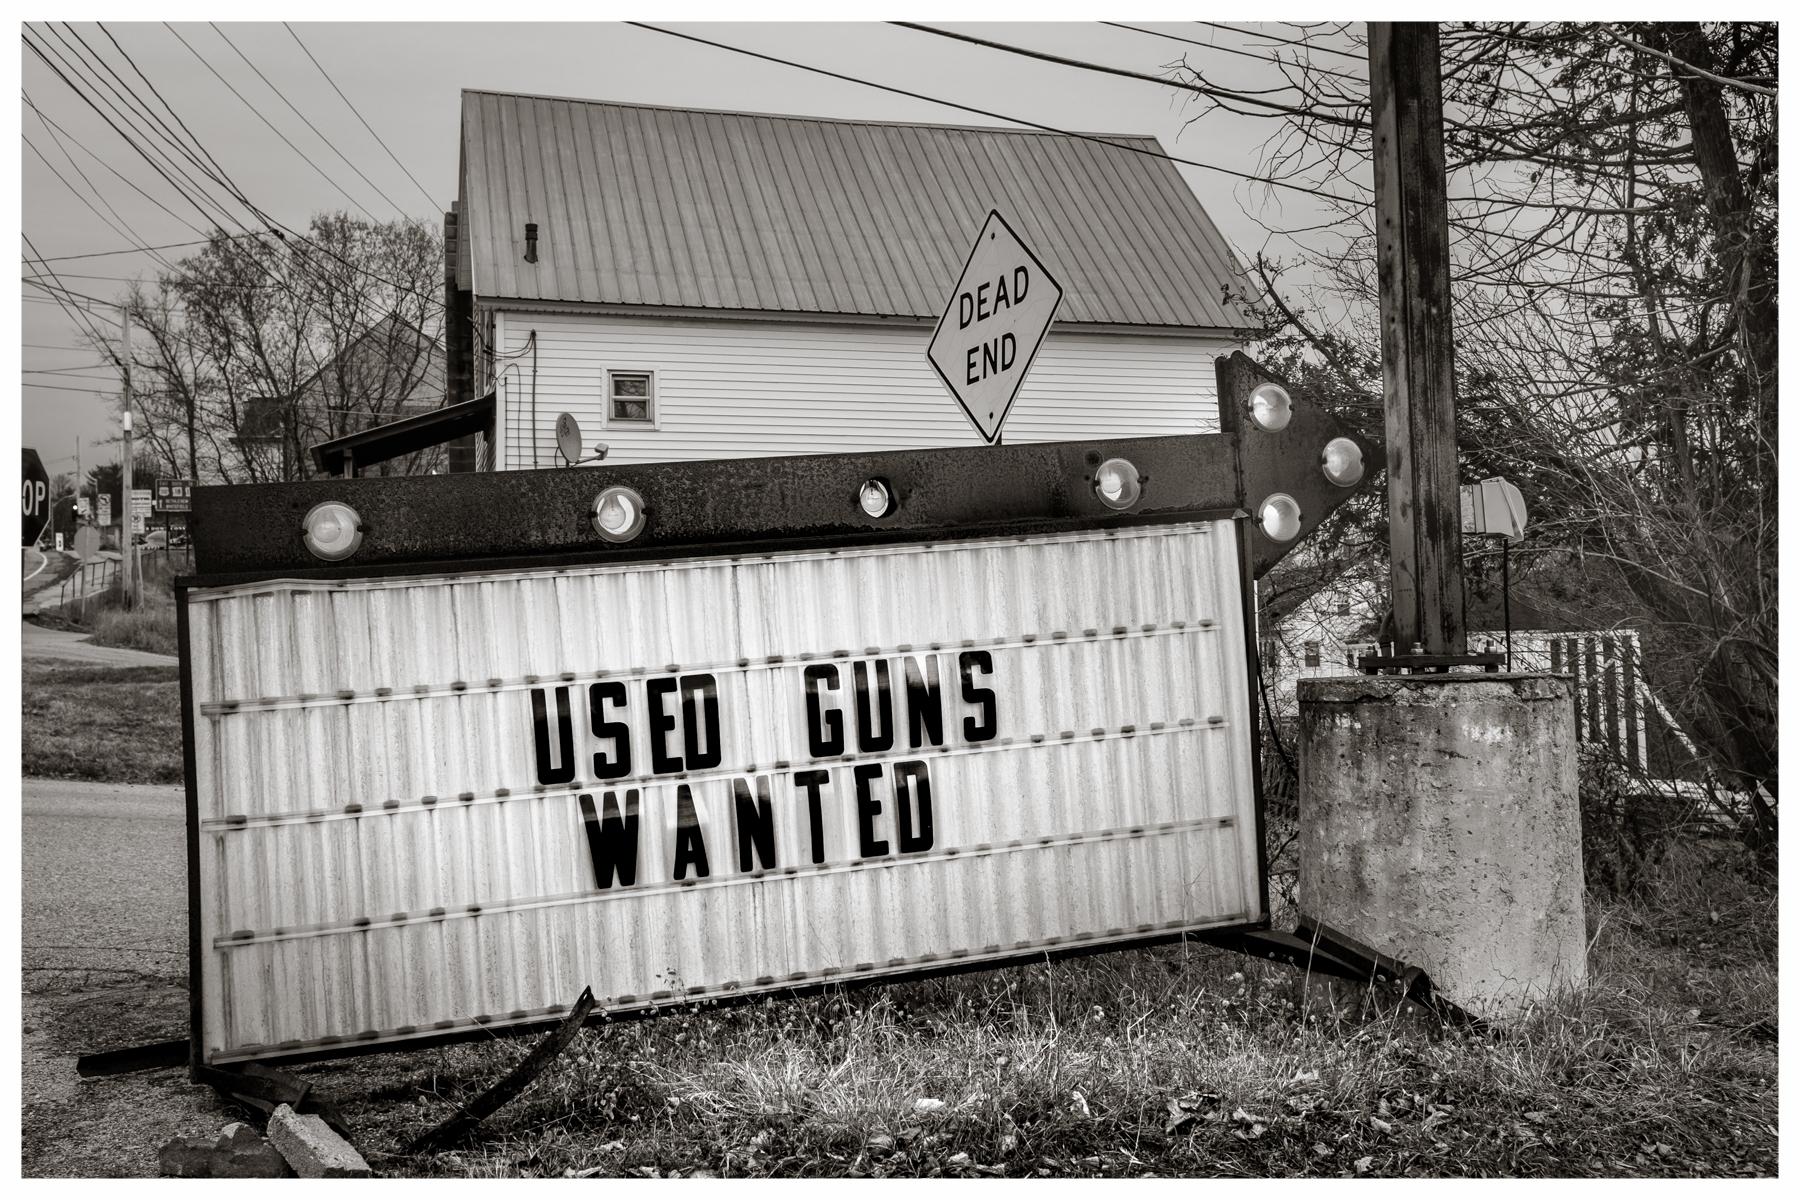 Used Guns Wanted  Littleton, NH 2015